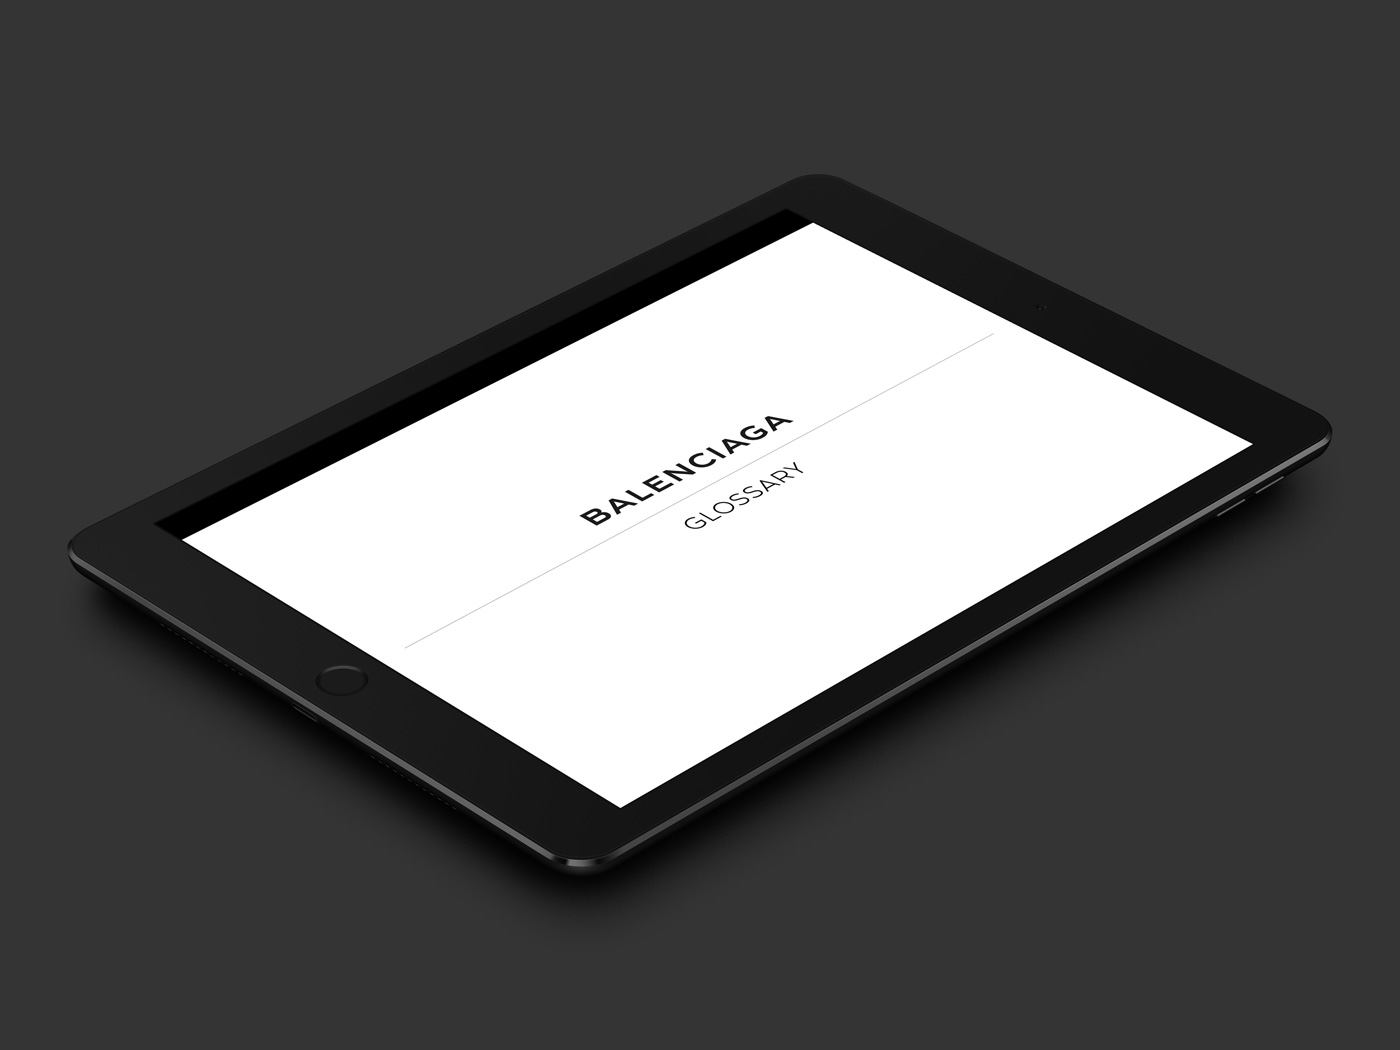 Balenciaga Glossary, service après vente ebook - Damien Rossier